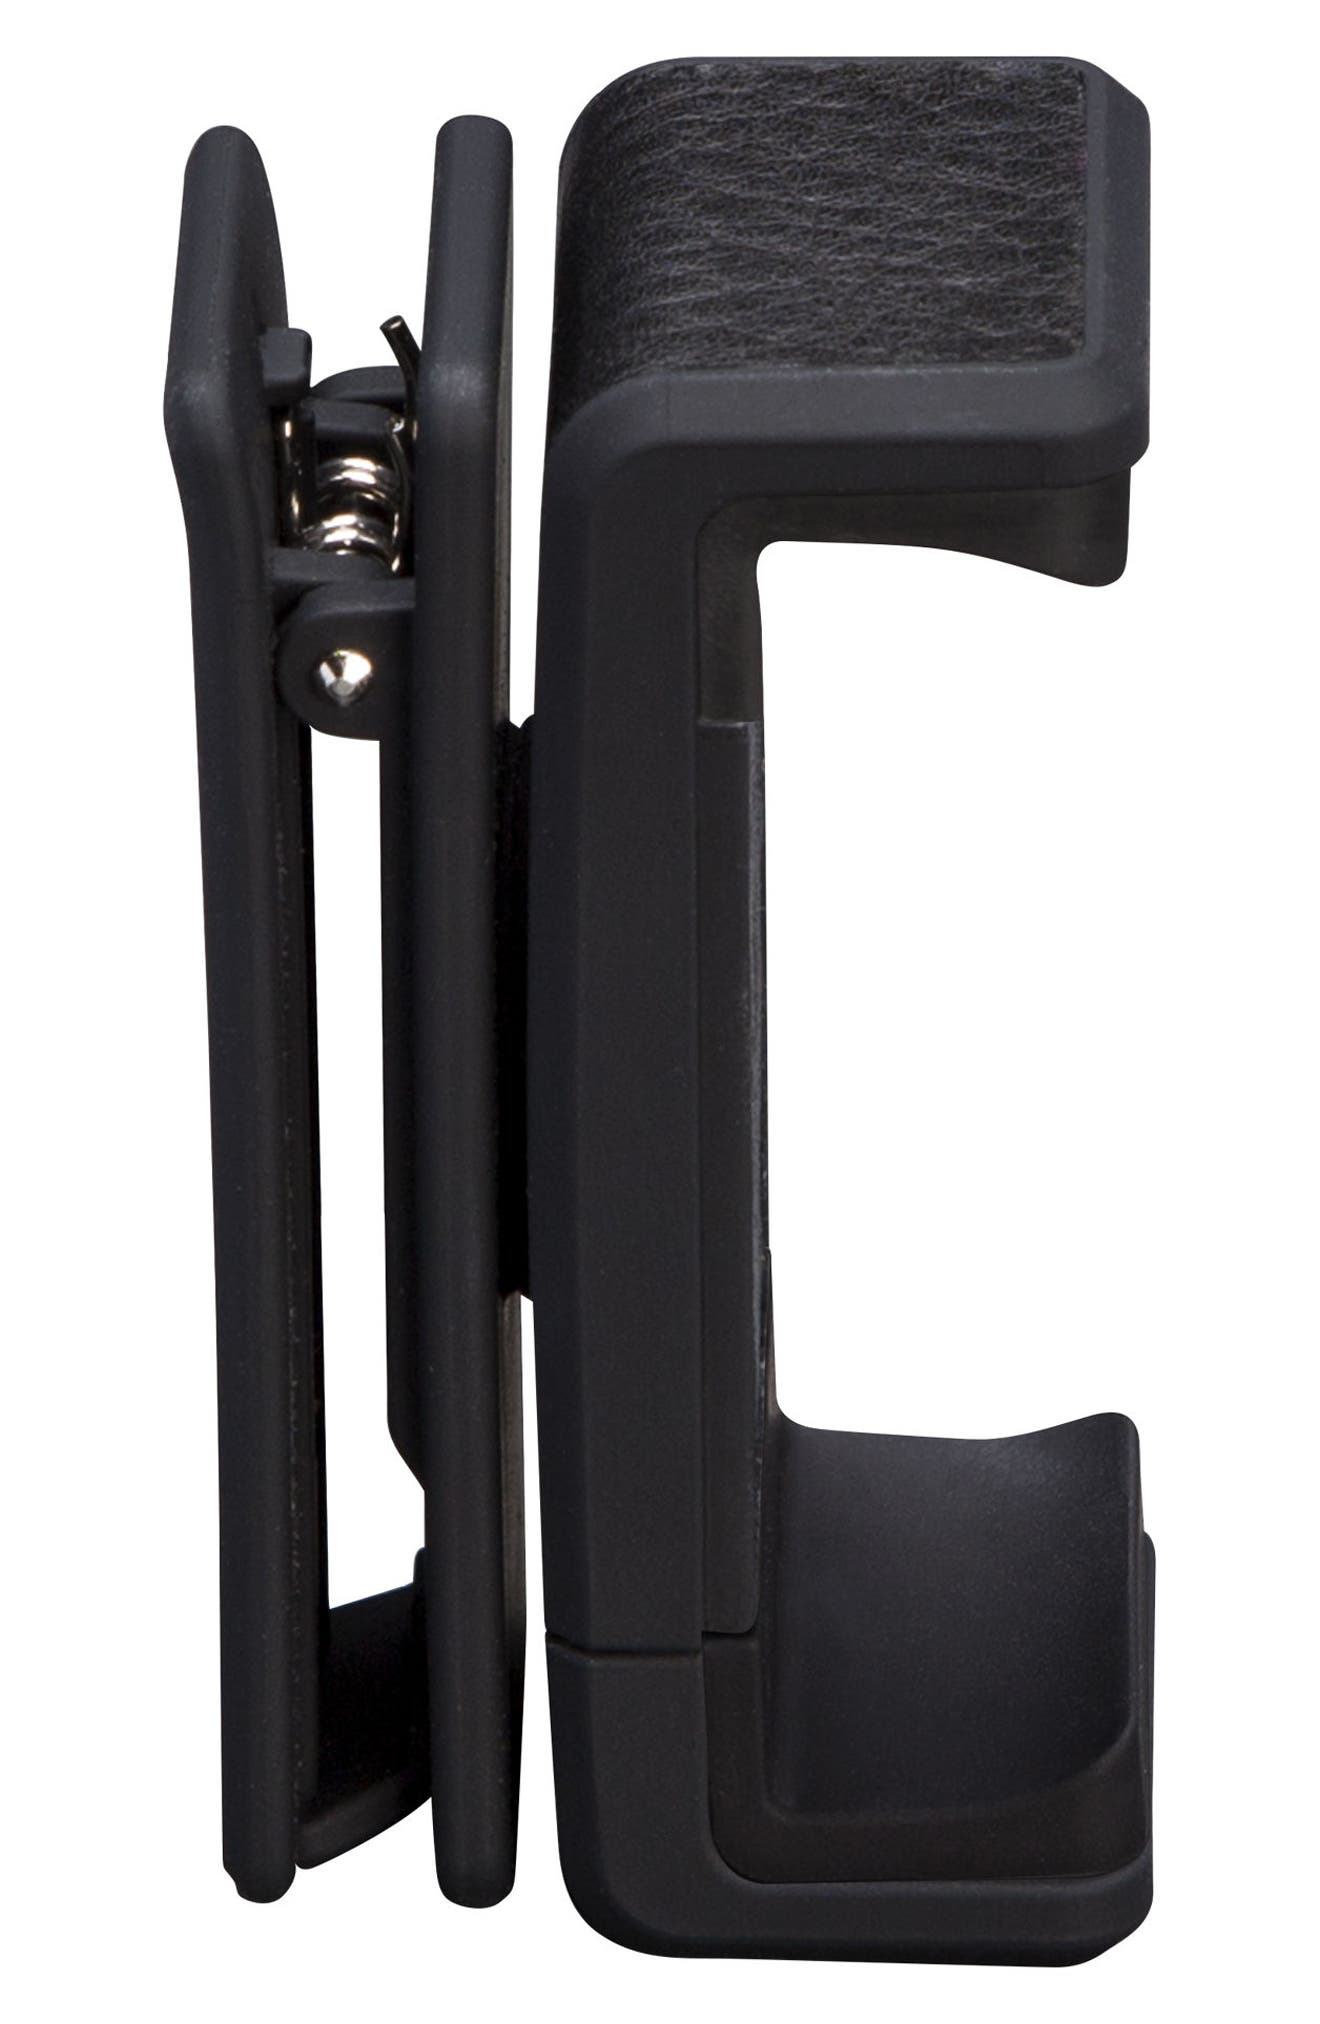 Universal Smartphone Beltclip,                             Alternate thumbnail 3, color,                             Black